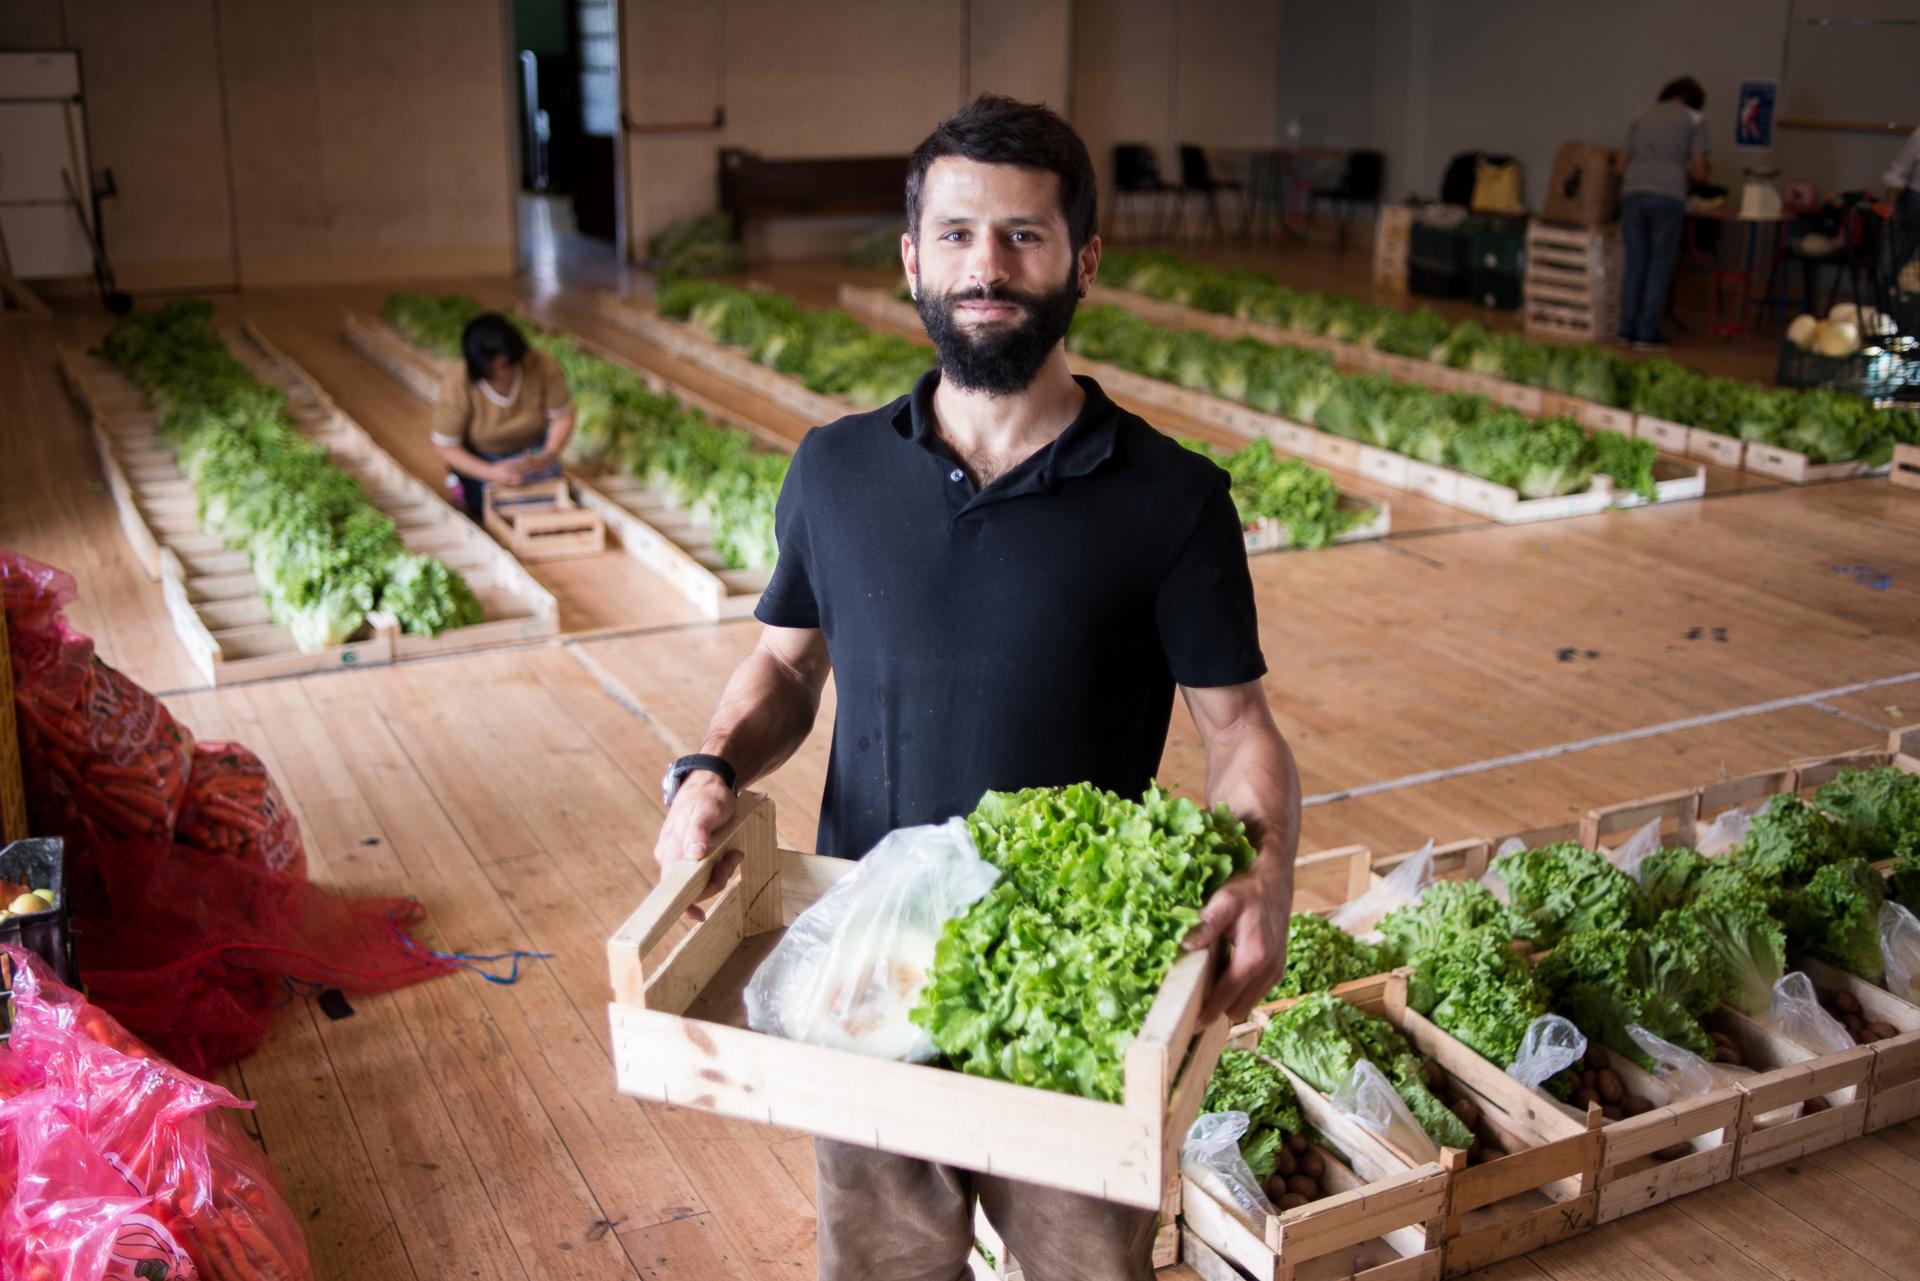 Member of Fruta Feia - Portugese organisation fighting food waste